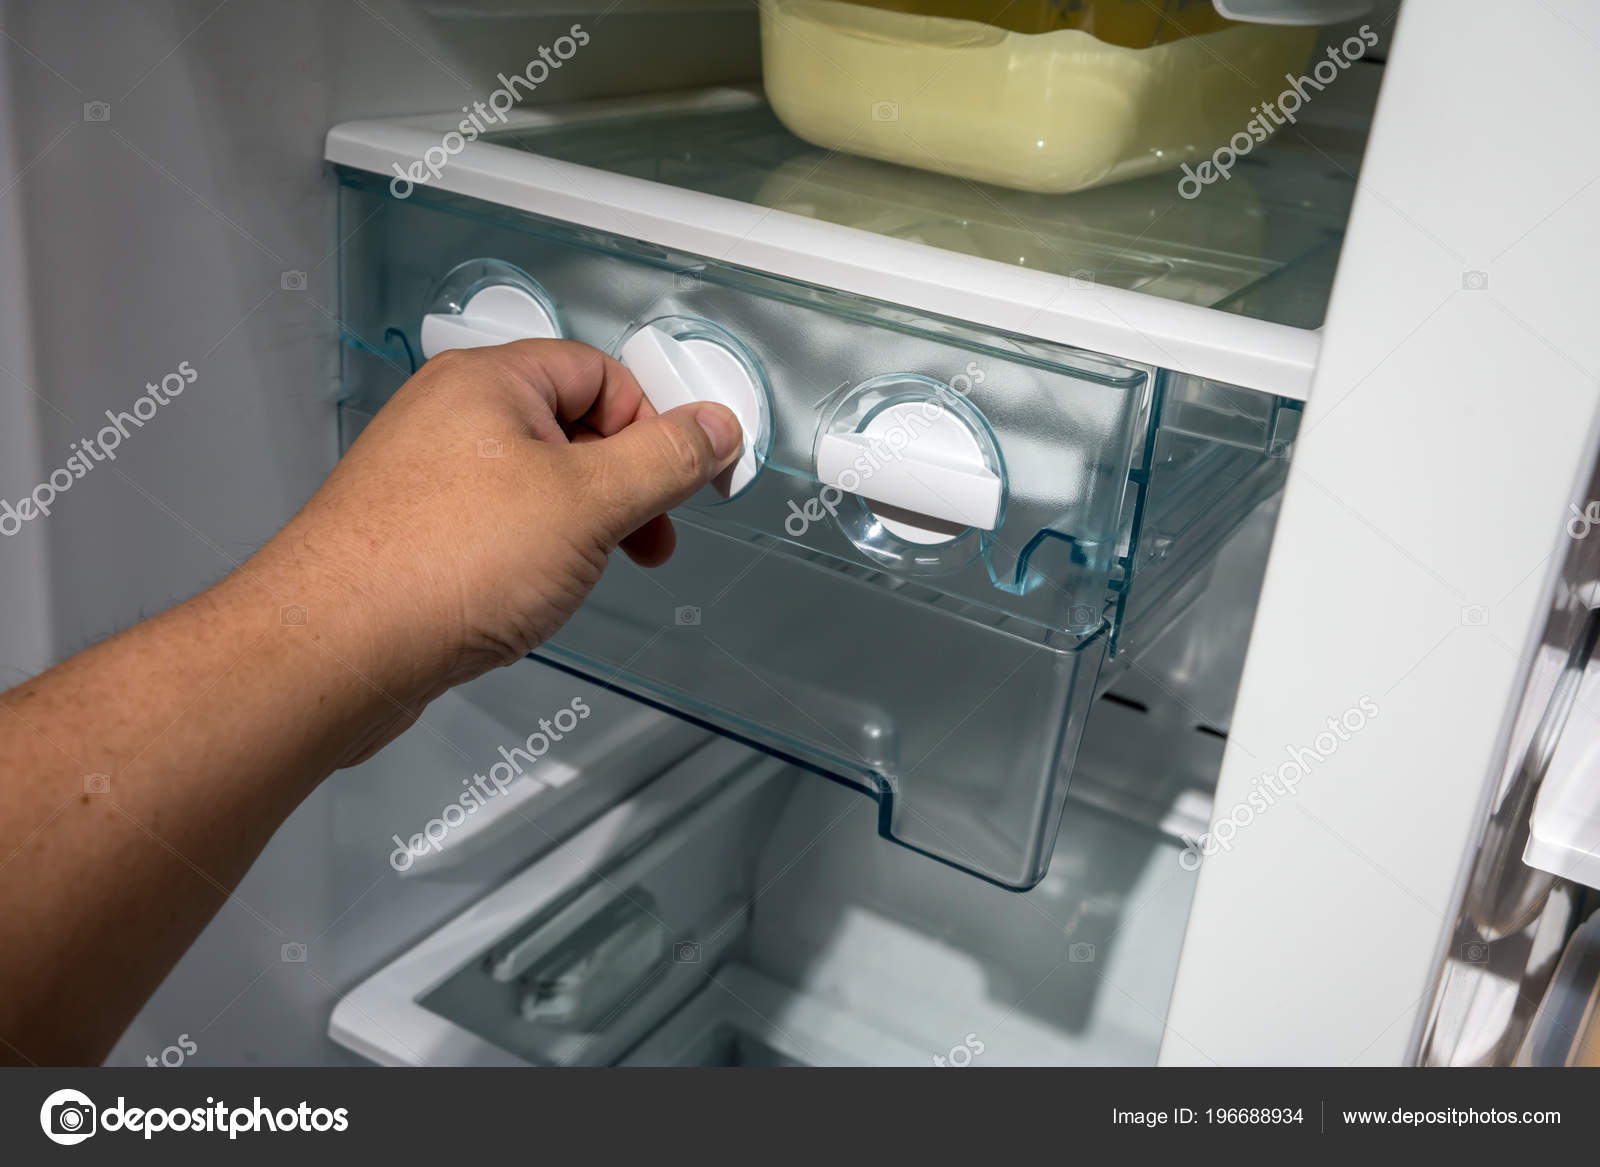 Geschlossen Bis Mann Hand Verdrehen Fur Eis Aus Der Eismaschine